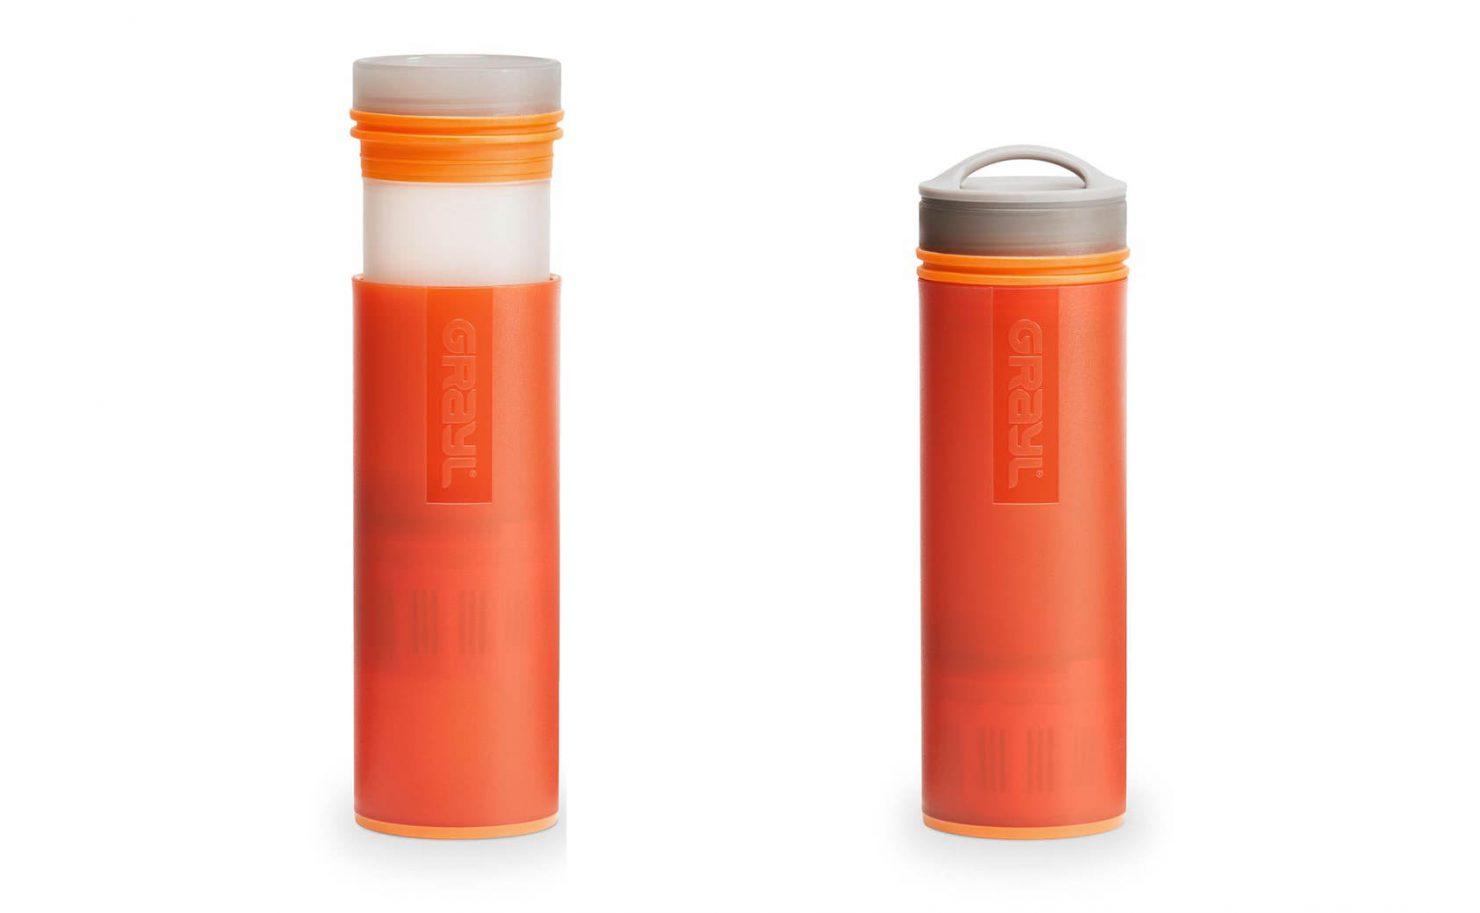 Grayl Ultralight Purification Bottle 1 1480x913 - The Grayl Ultralight Purification Bottle